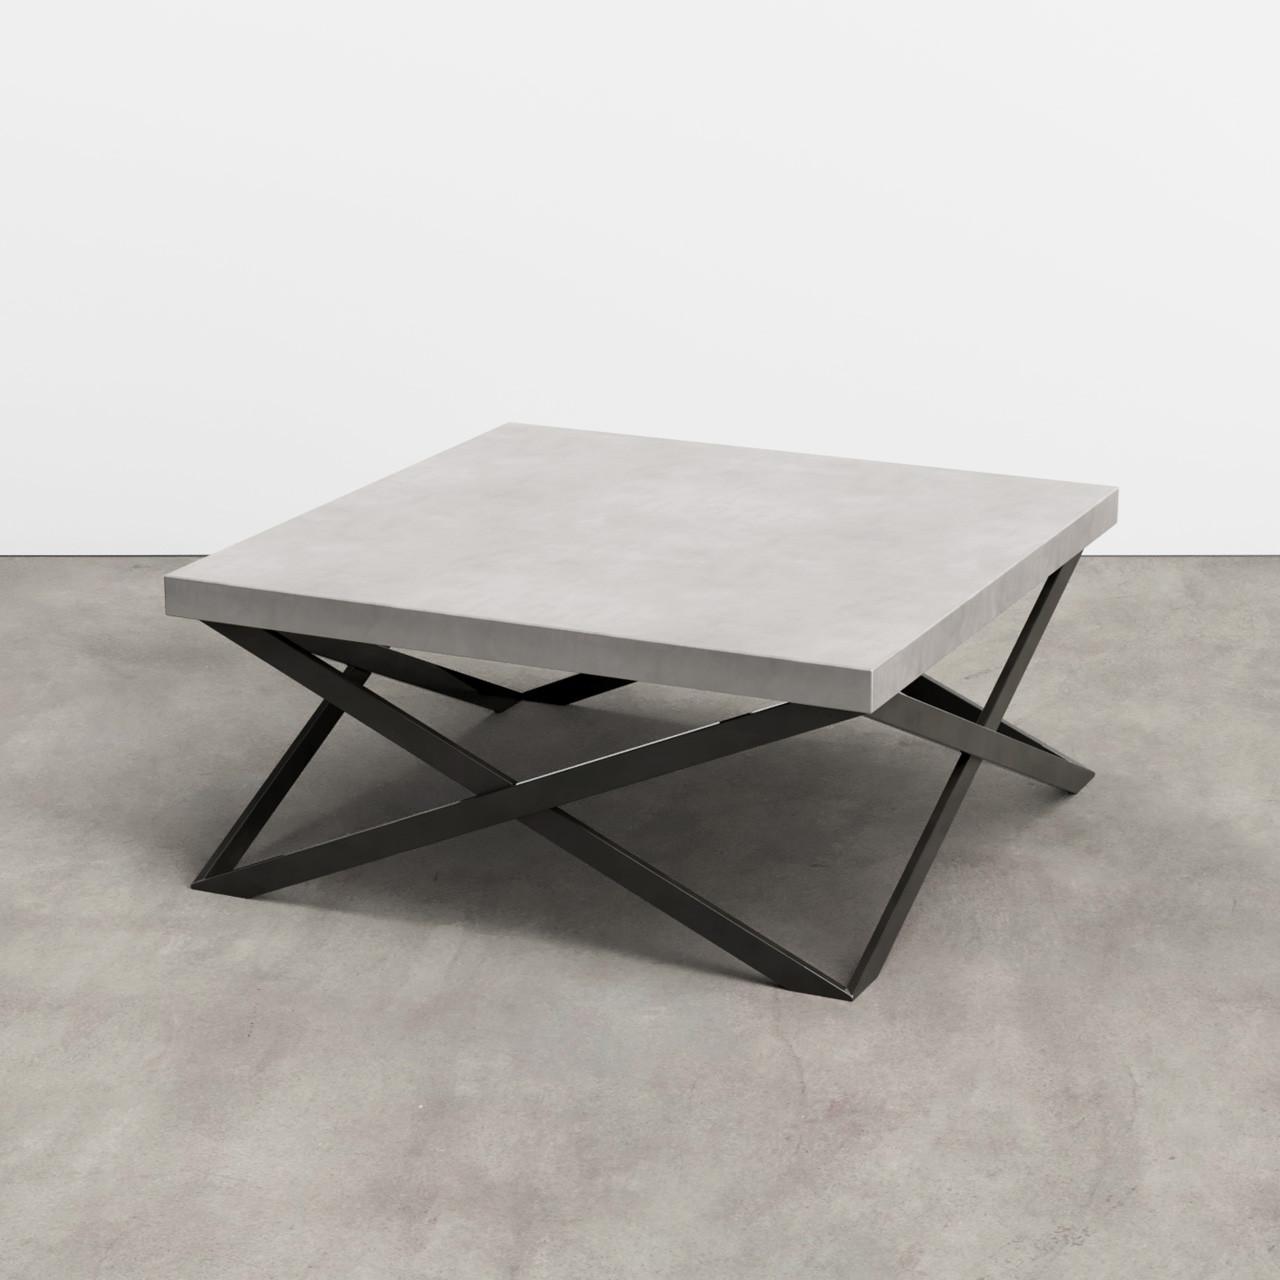 Mobius Concrete Coffee Table Trueform Concrete